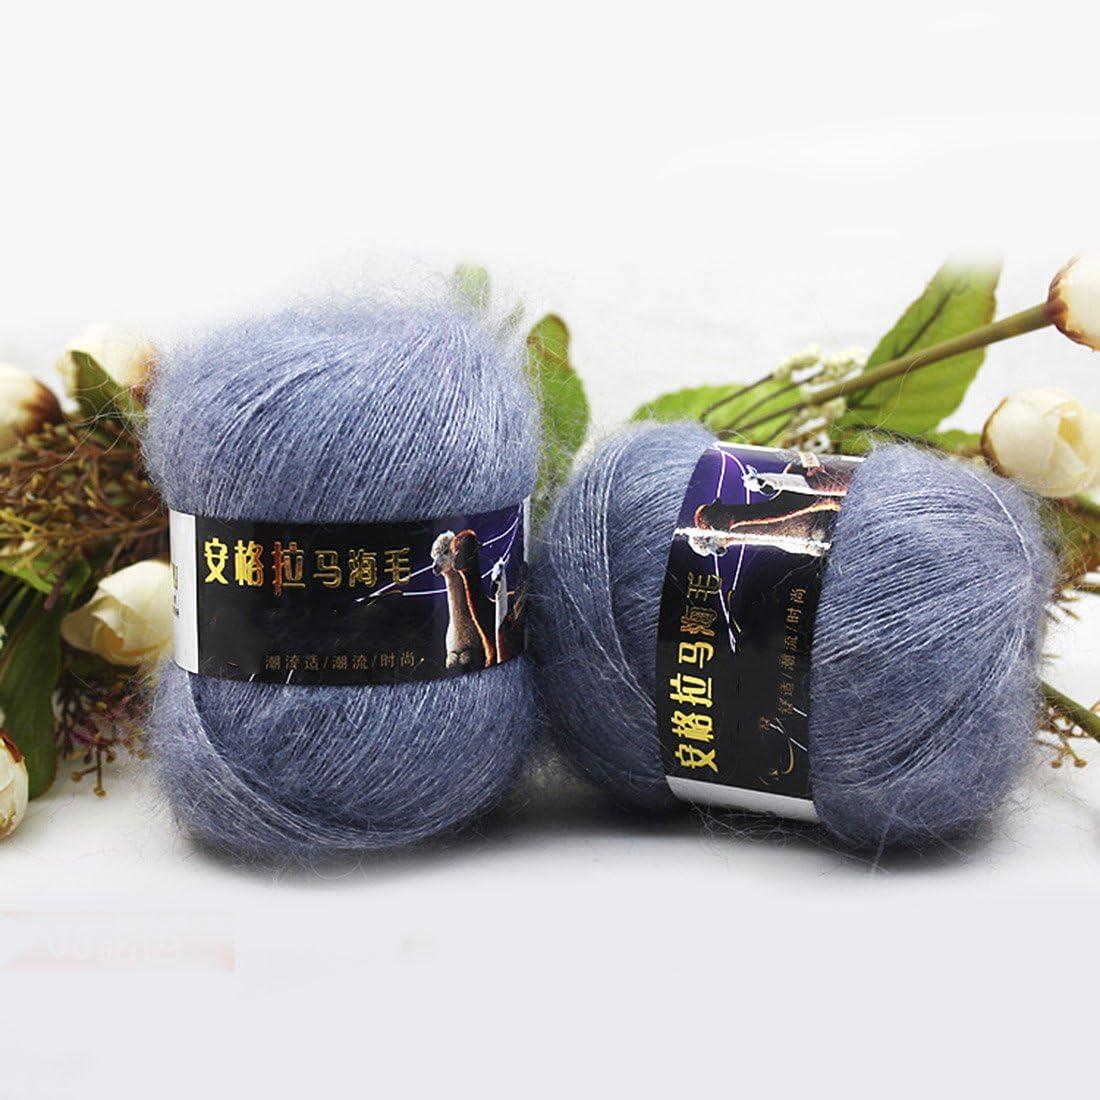 Fashion Soft Luxury Mohair Wool Knitting Yarn Sweater Scarf Knitting Wool-Dark Green